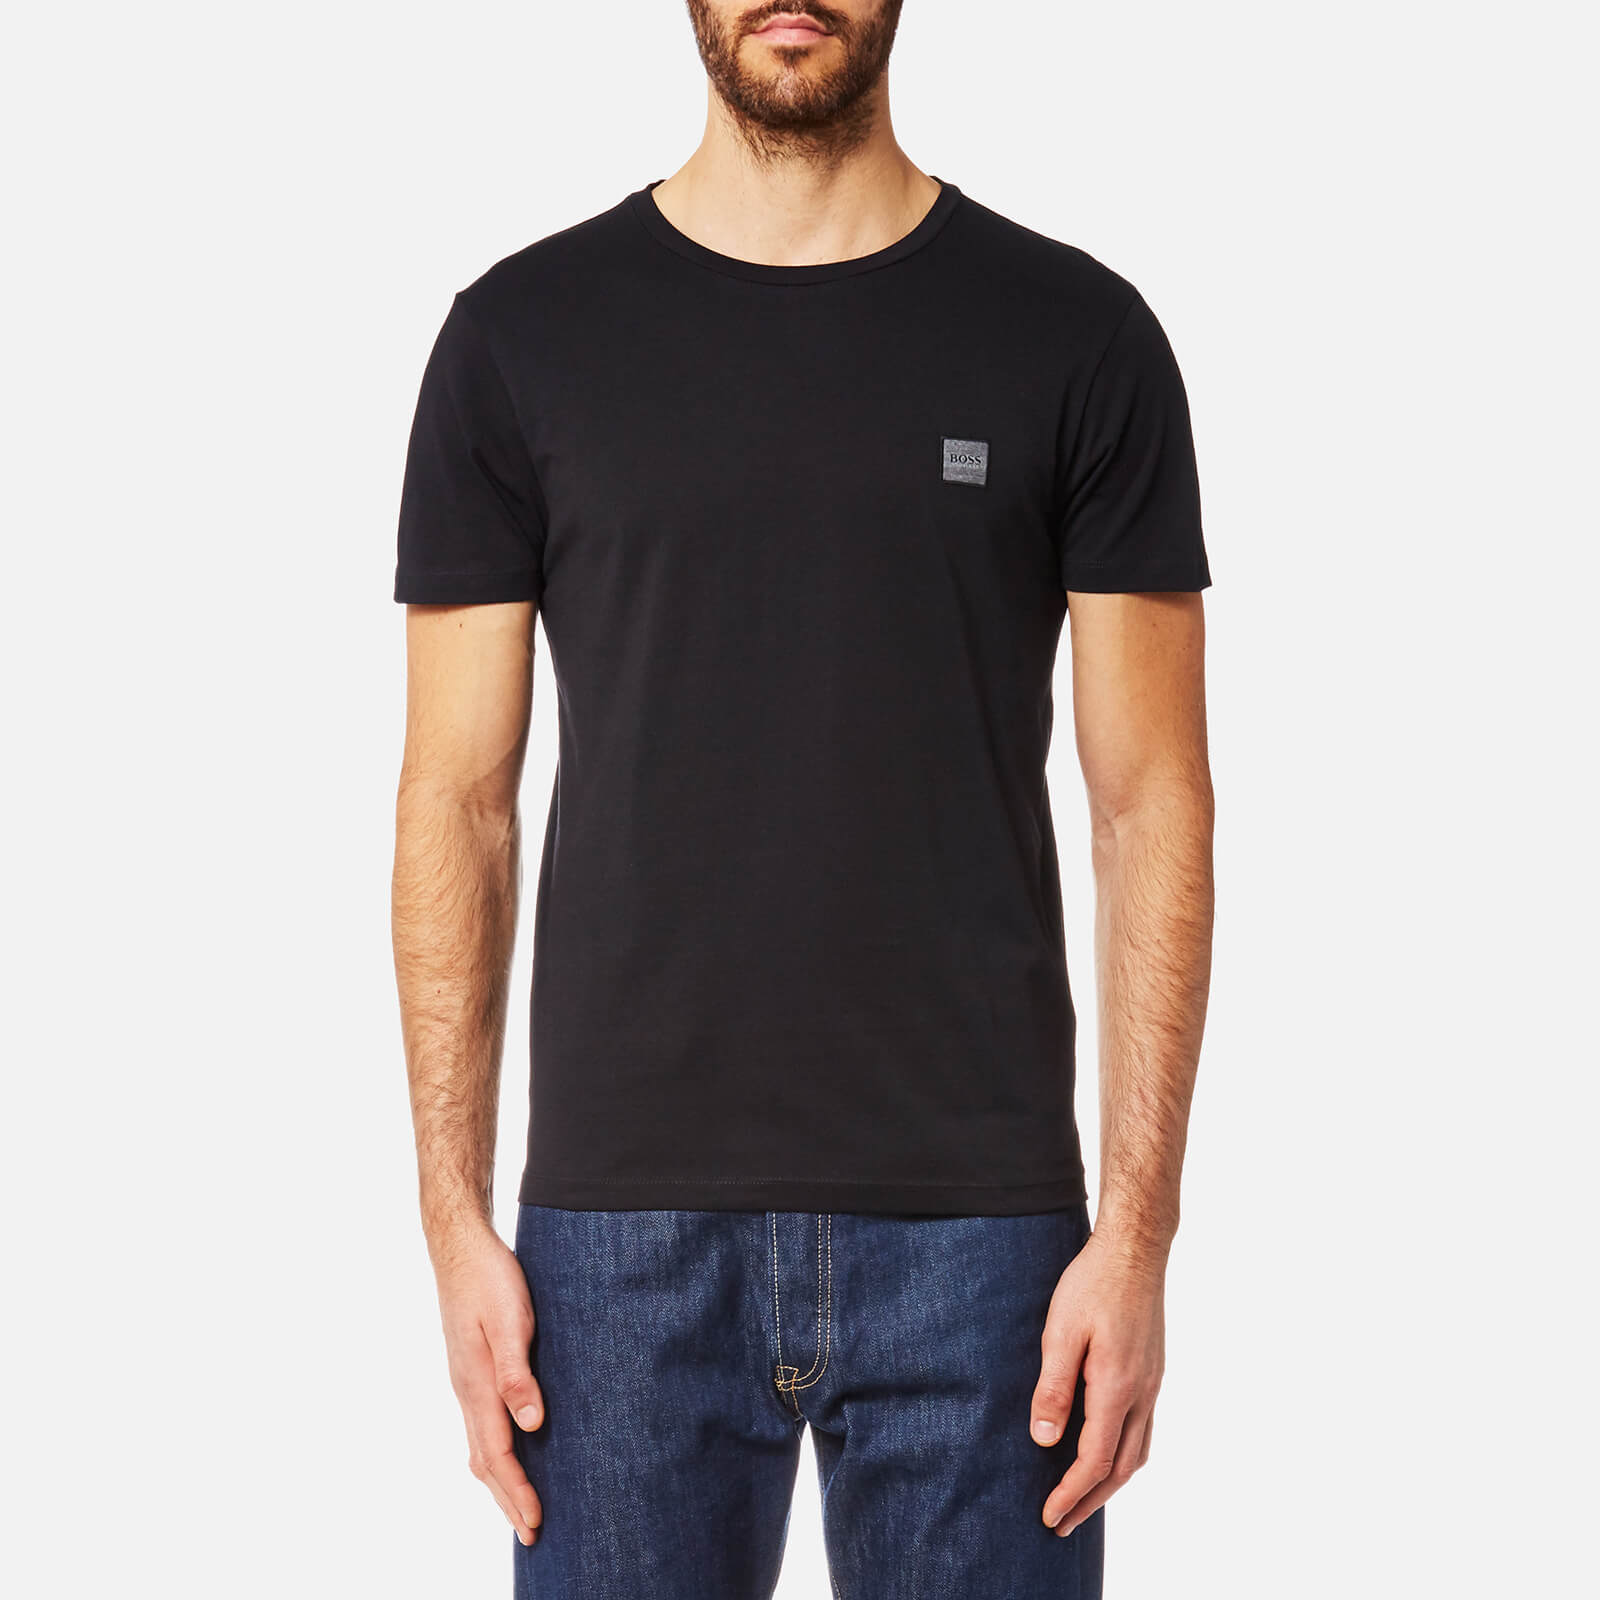 665b7e00a BOSS Orange Men's Tommi Crew Neck T-Shirt - Black - Free UK Delivery over  £50